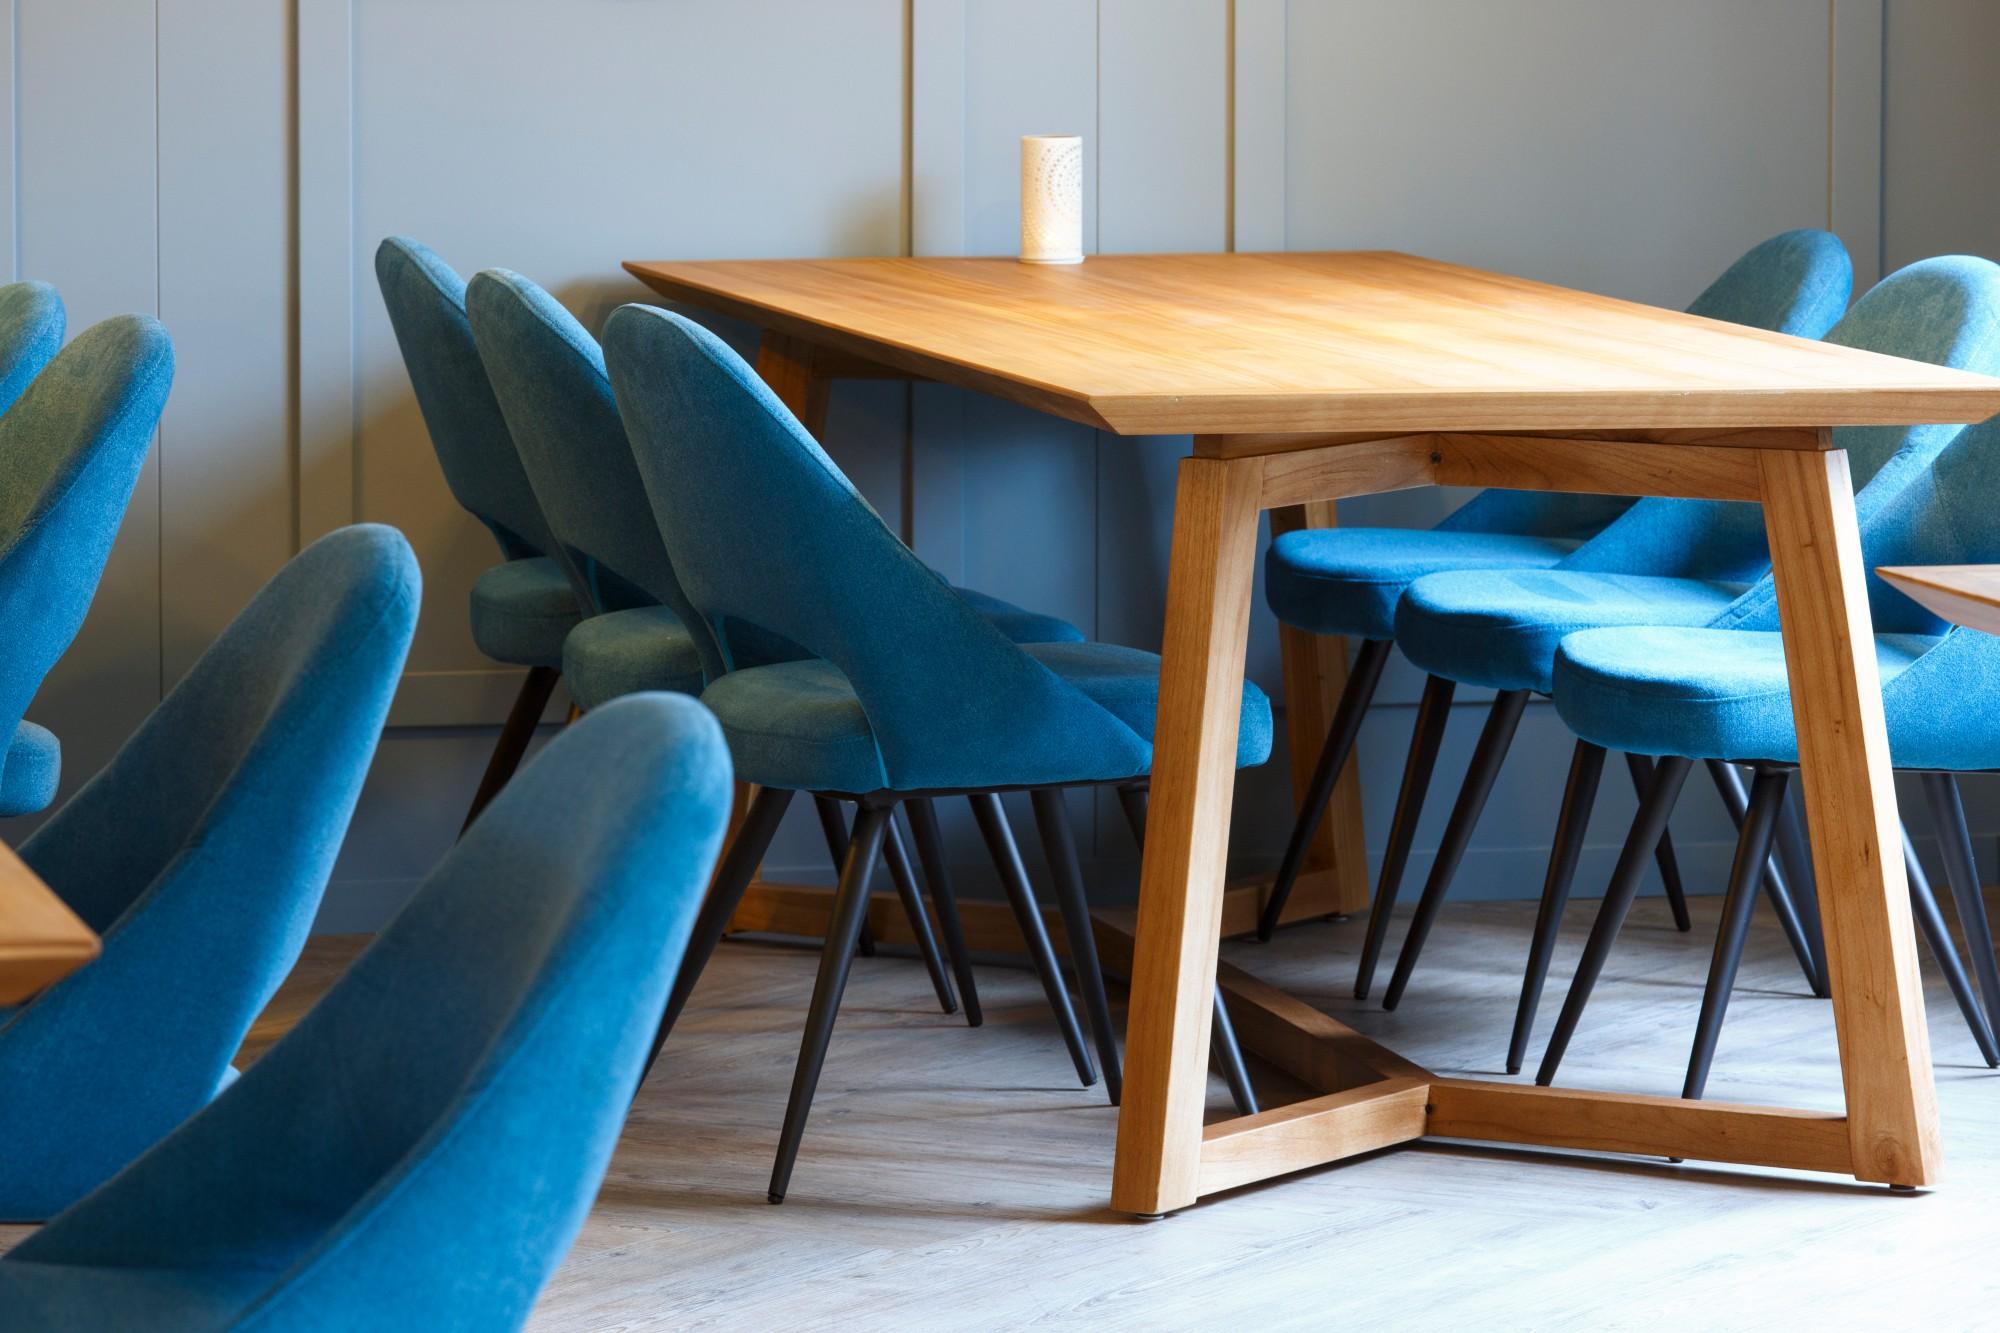 https://www.otdesign.com/wp-content/uploads/2020/11/OTdesign_Restaurant_De_Boschrand_2_3146_otdesignotti.jpg